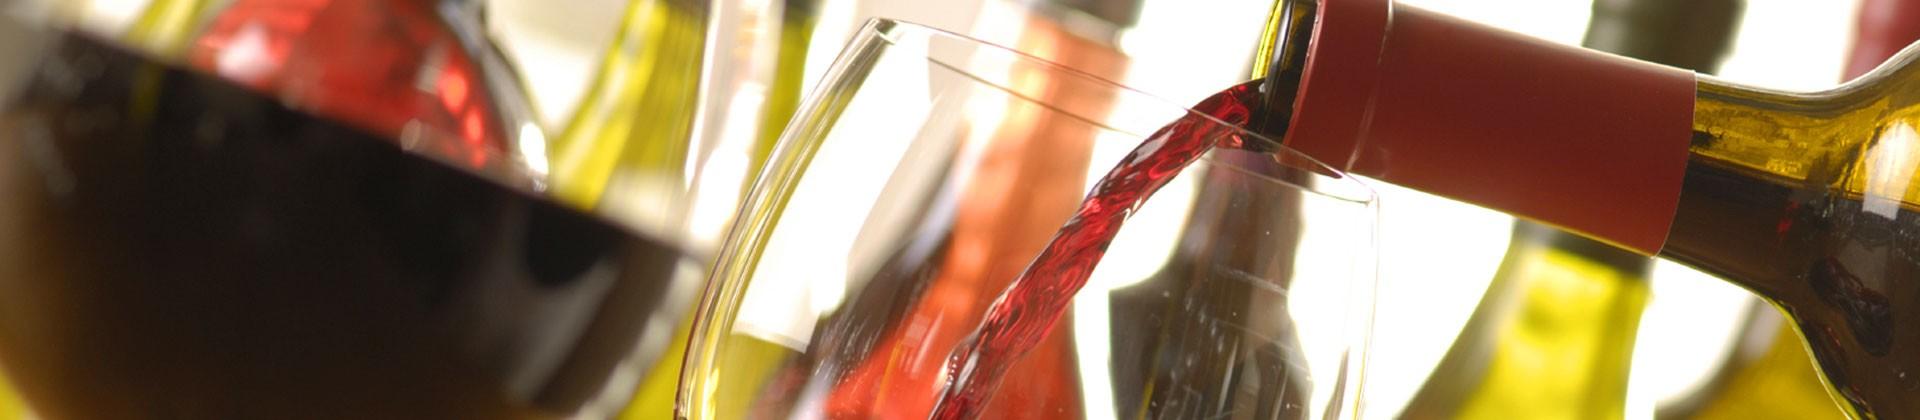 https://www.goodmorningtenerife.com/wp-content/uploads/2014/08/02_slide_wine_GM_Tenerife-1920x420.jpg